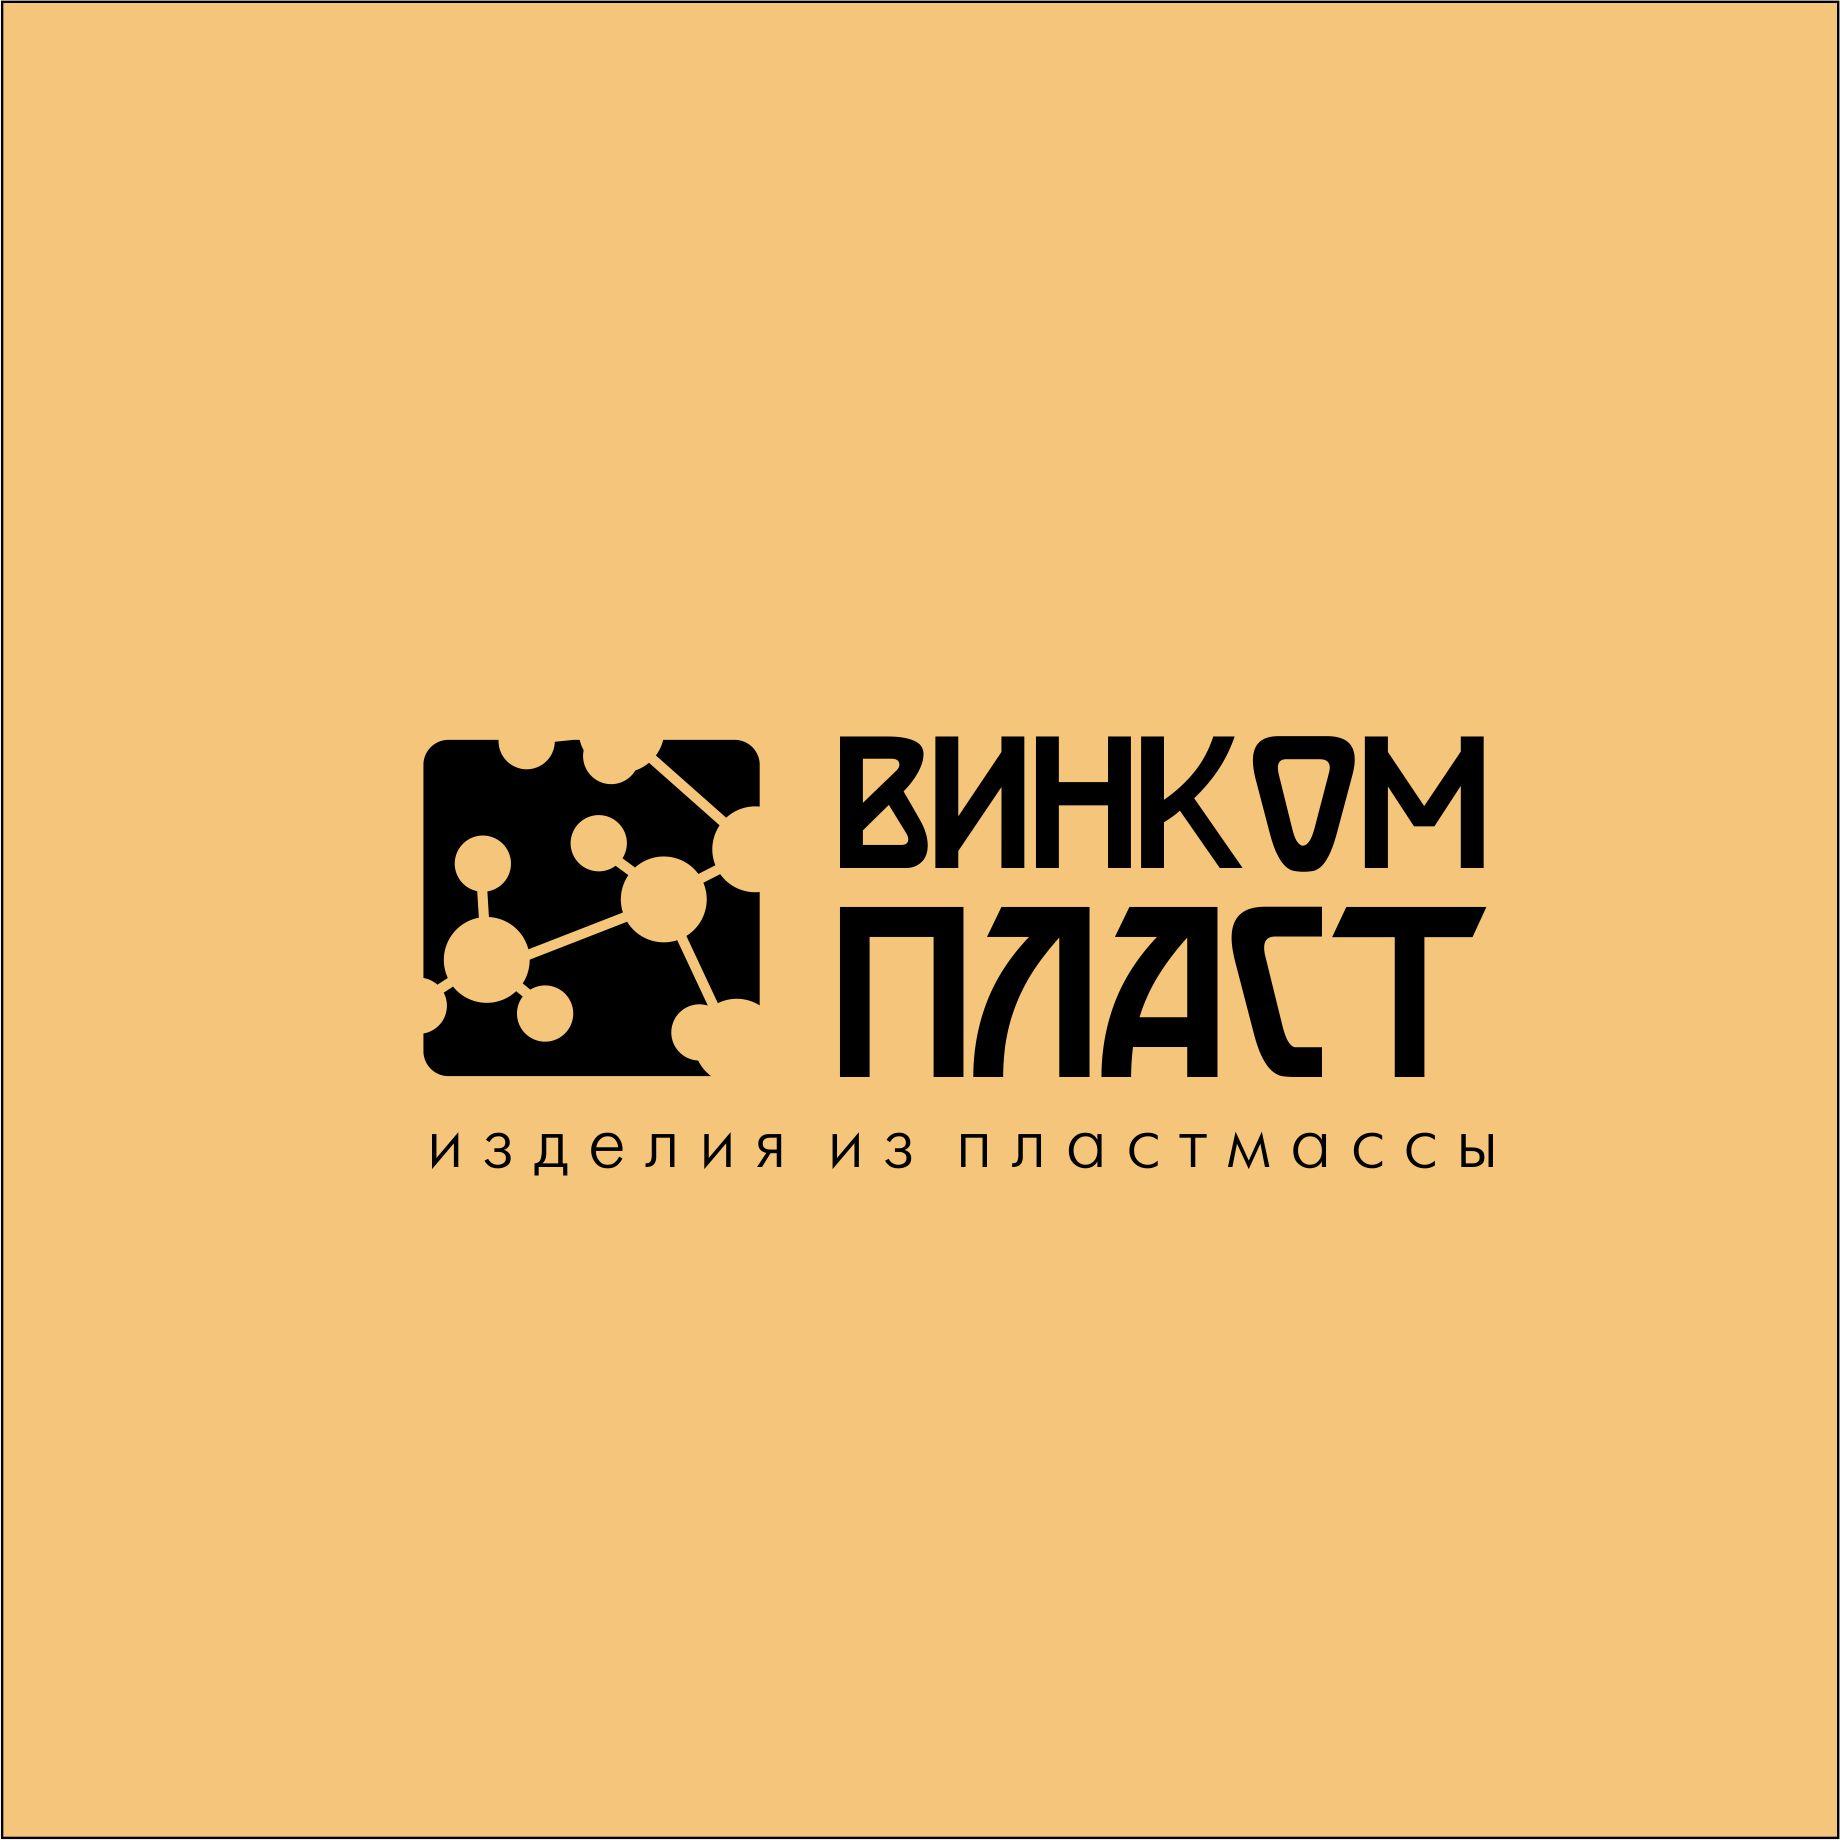 Логотип, фавикон и визитка для компании Винком Пласт  фото f_6715c479bed37b79.jpg